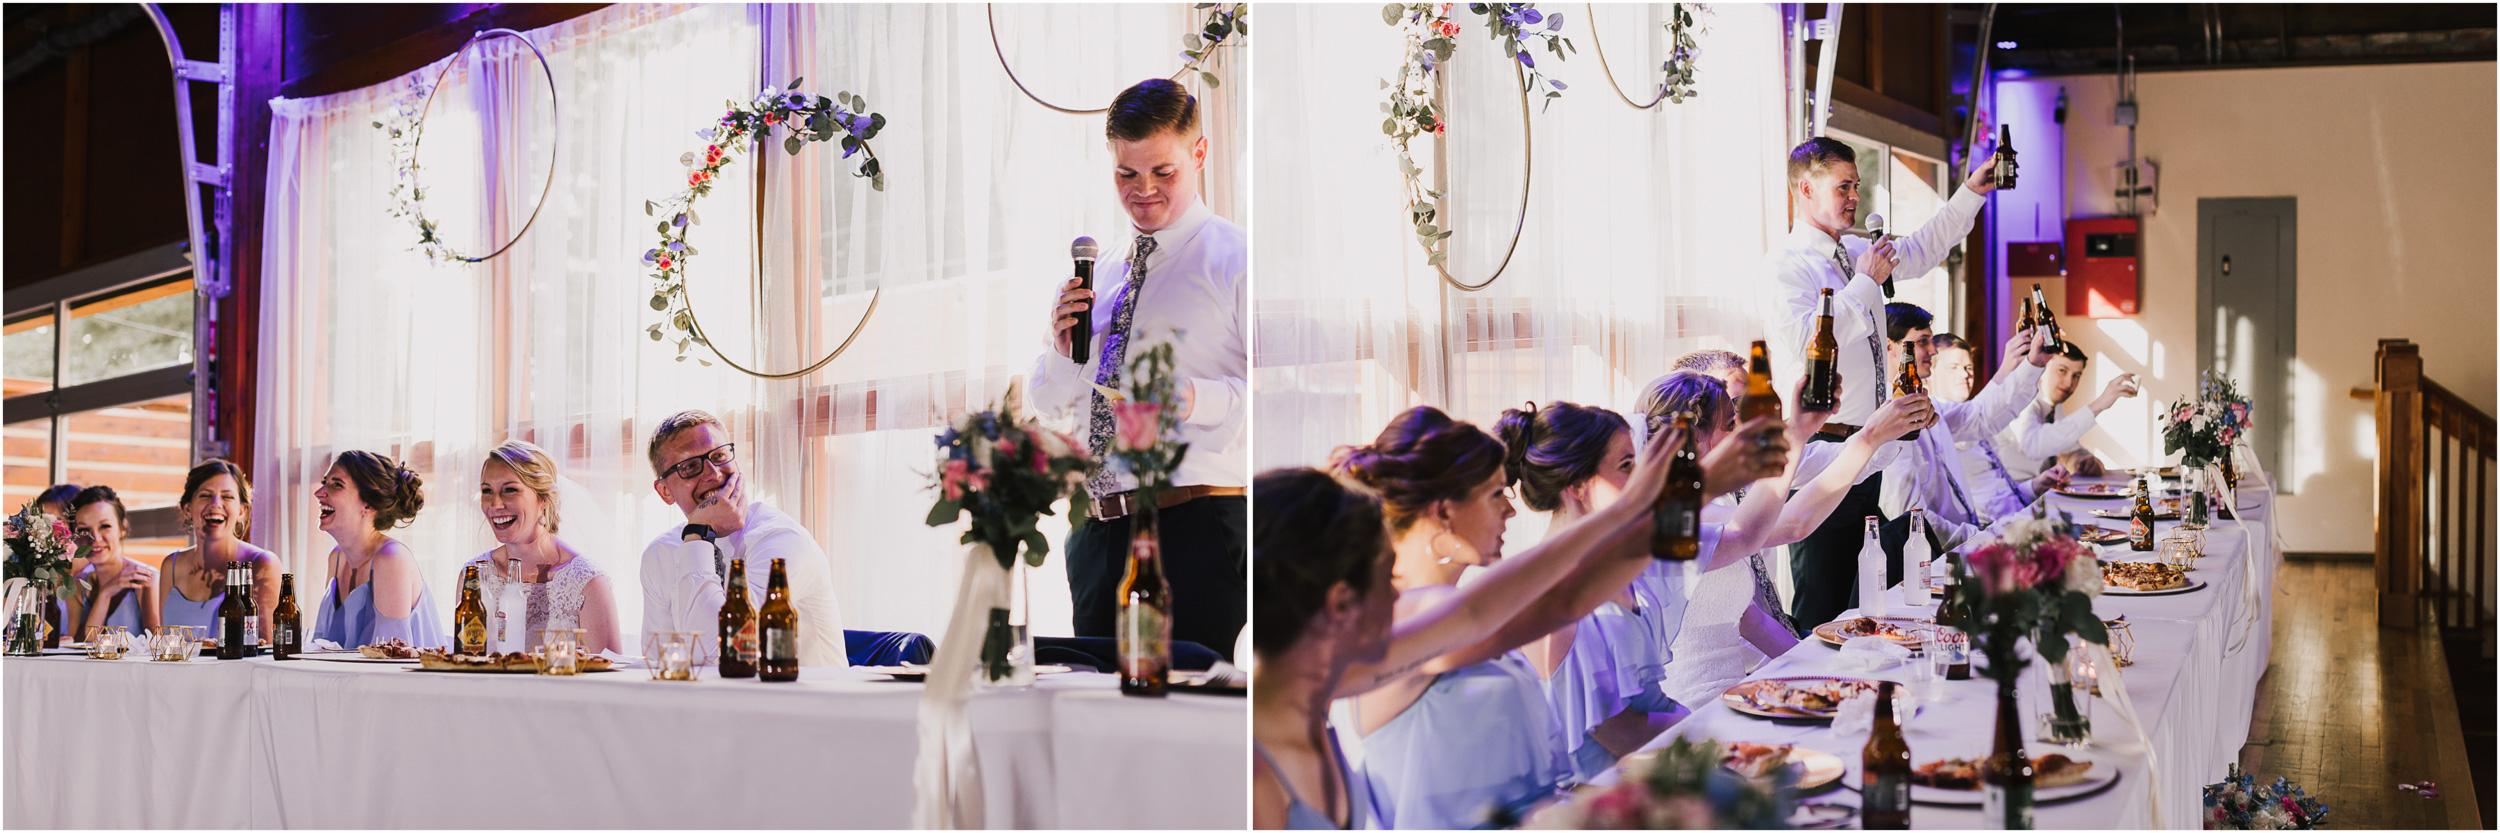 alyssa barletter photography classic kansas city summer wedding photographer dustin and erica king-65.jpg